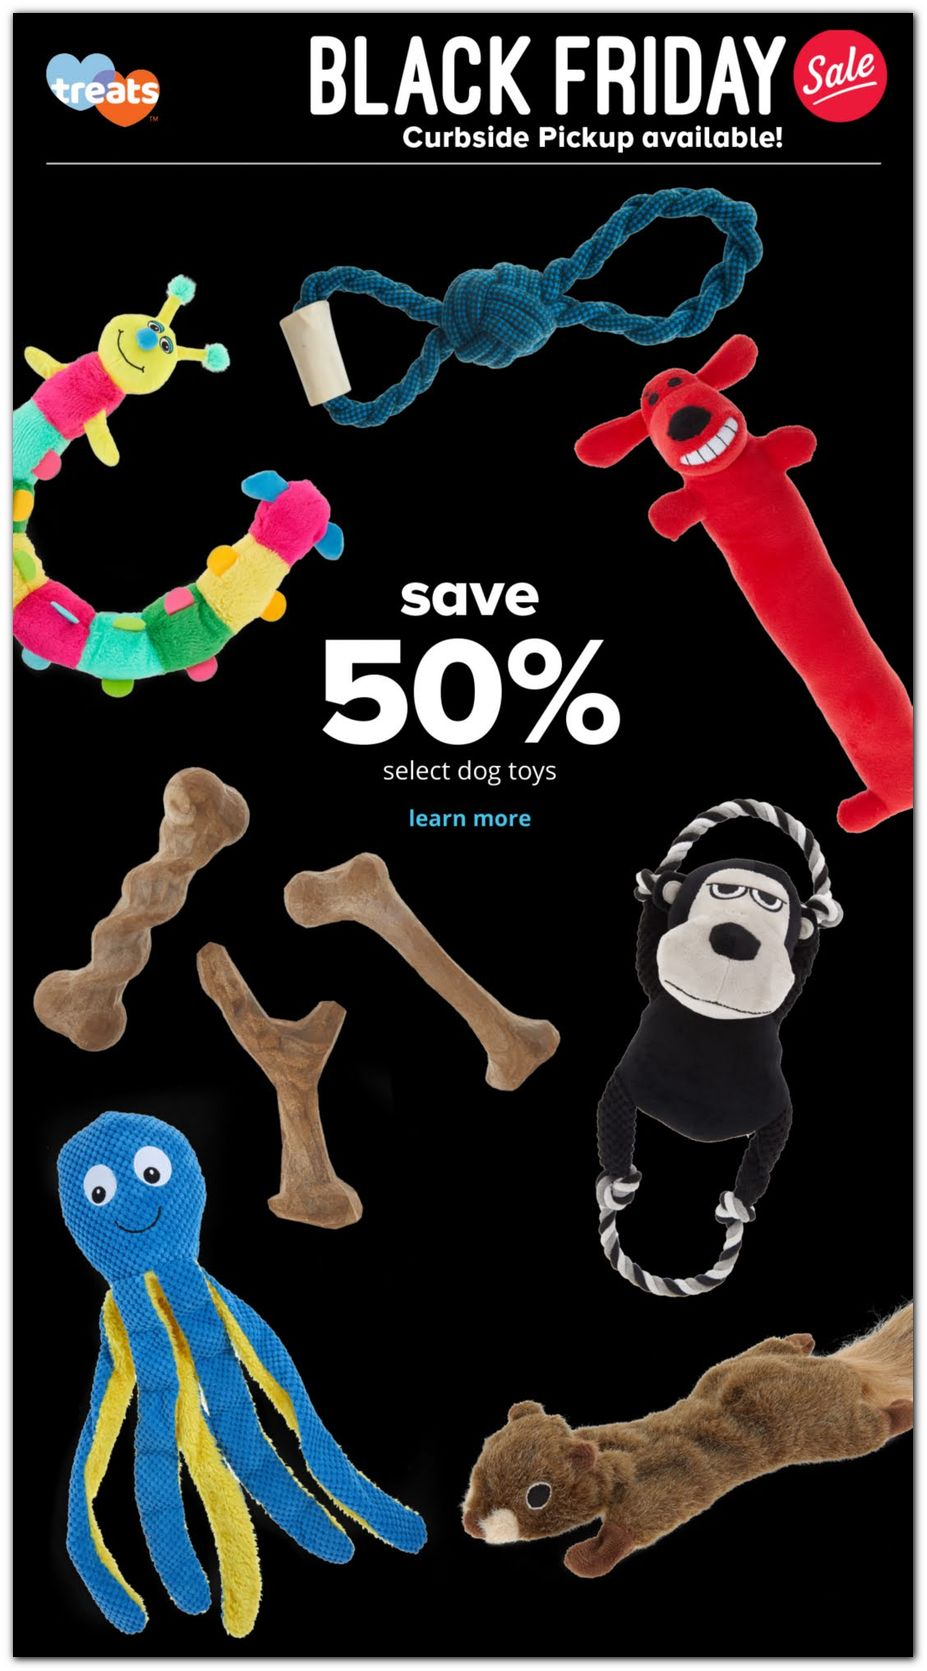 PetSmart Black Friday 2020 Page 3